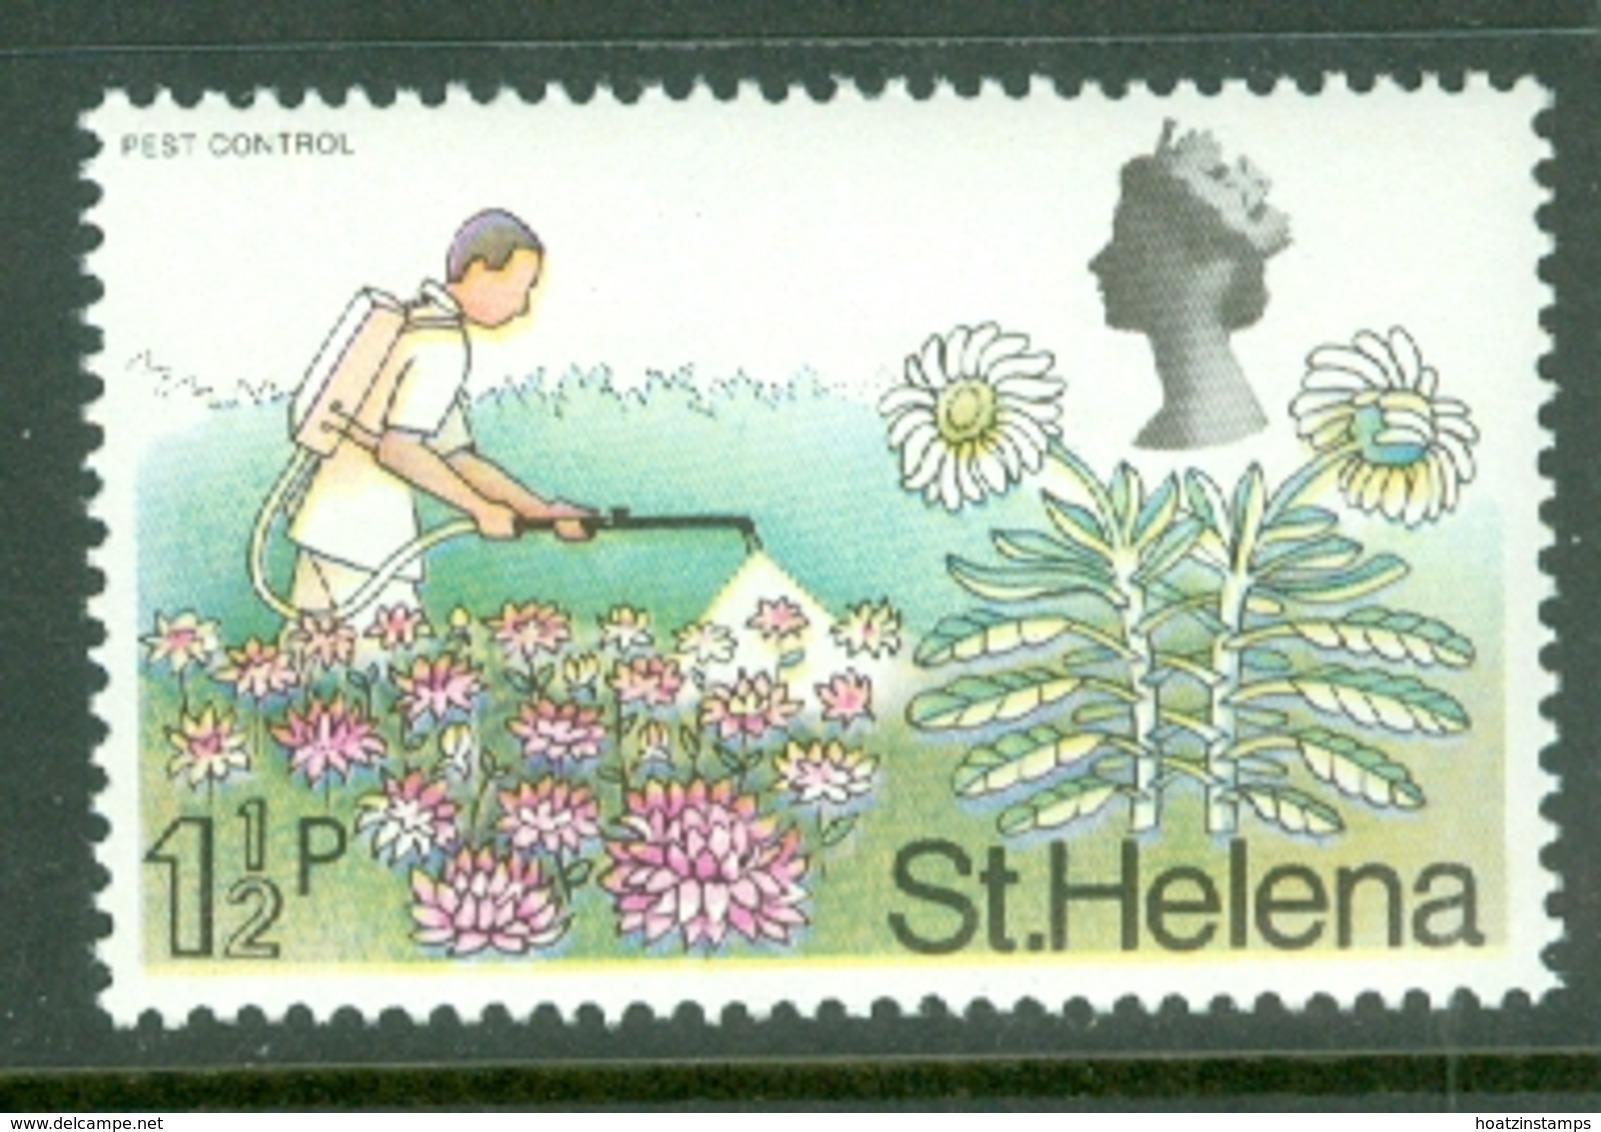 St Helena: 1971   QE II - Pictorial - Decimal Currency    SG263    1½p       MNH - St. Helena